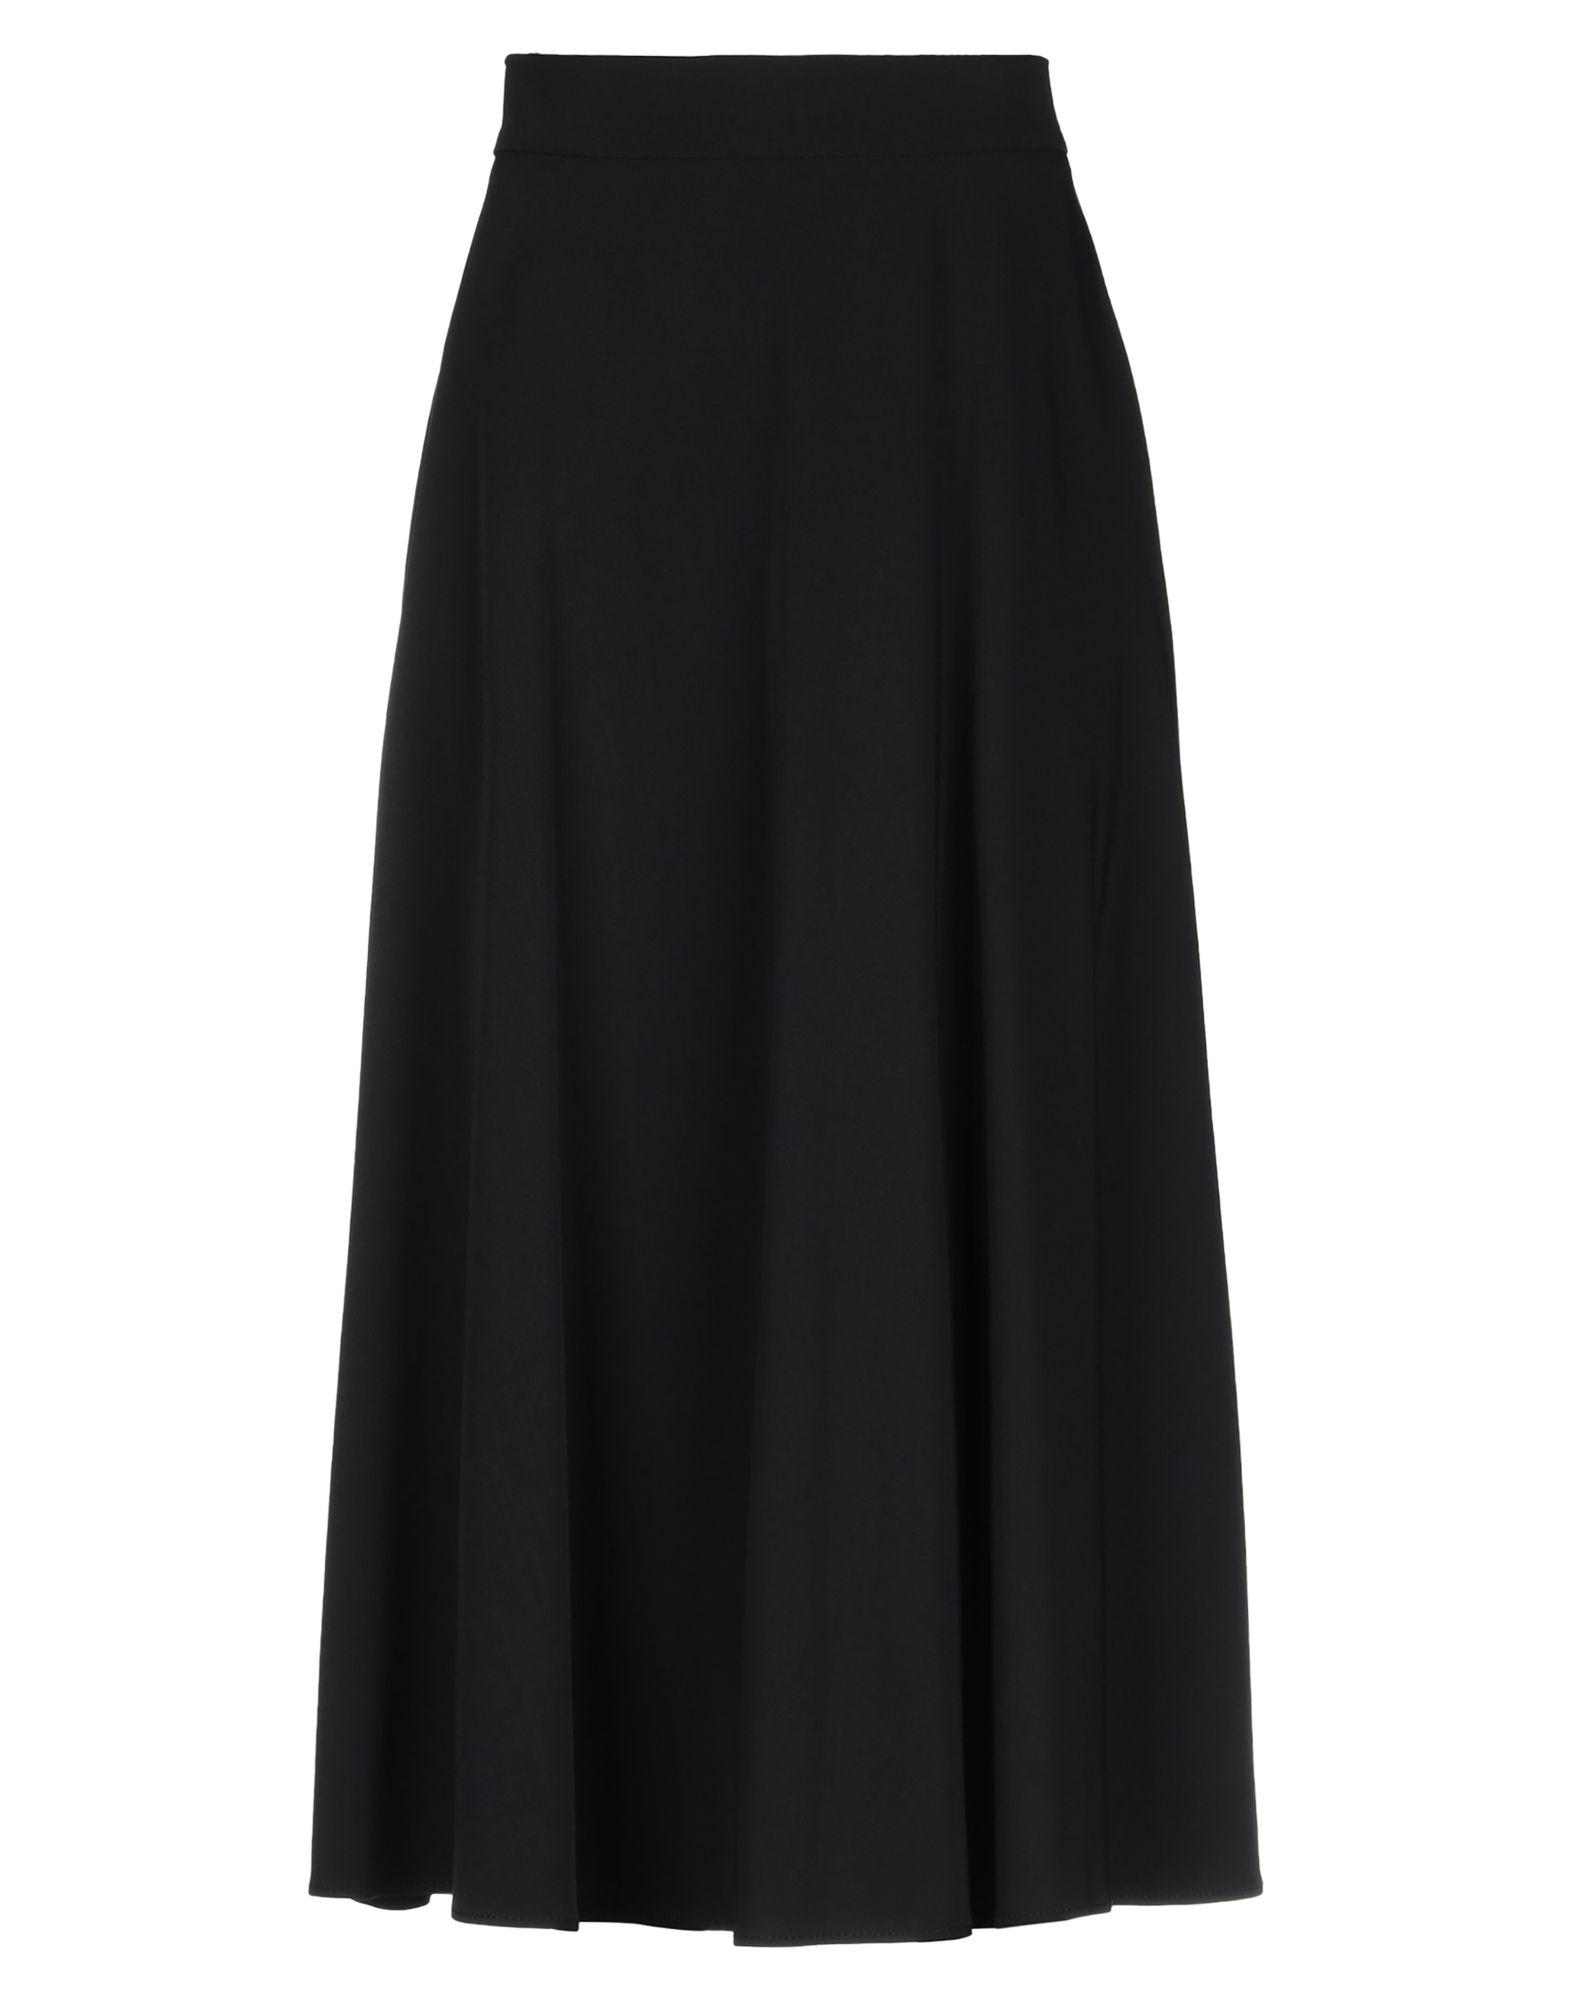 CARLA G. Юбка длиной 3/4 g na юбка длиной 3 4